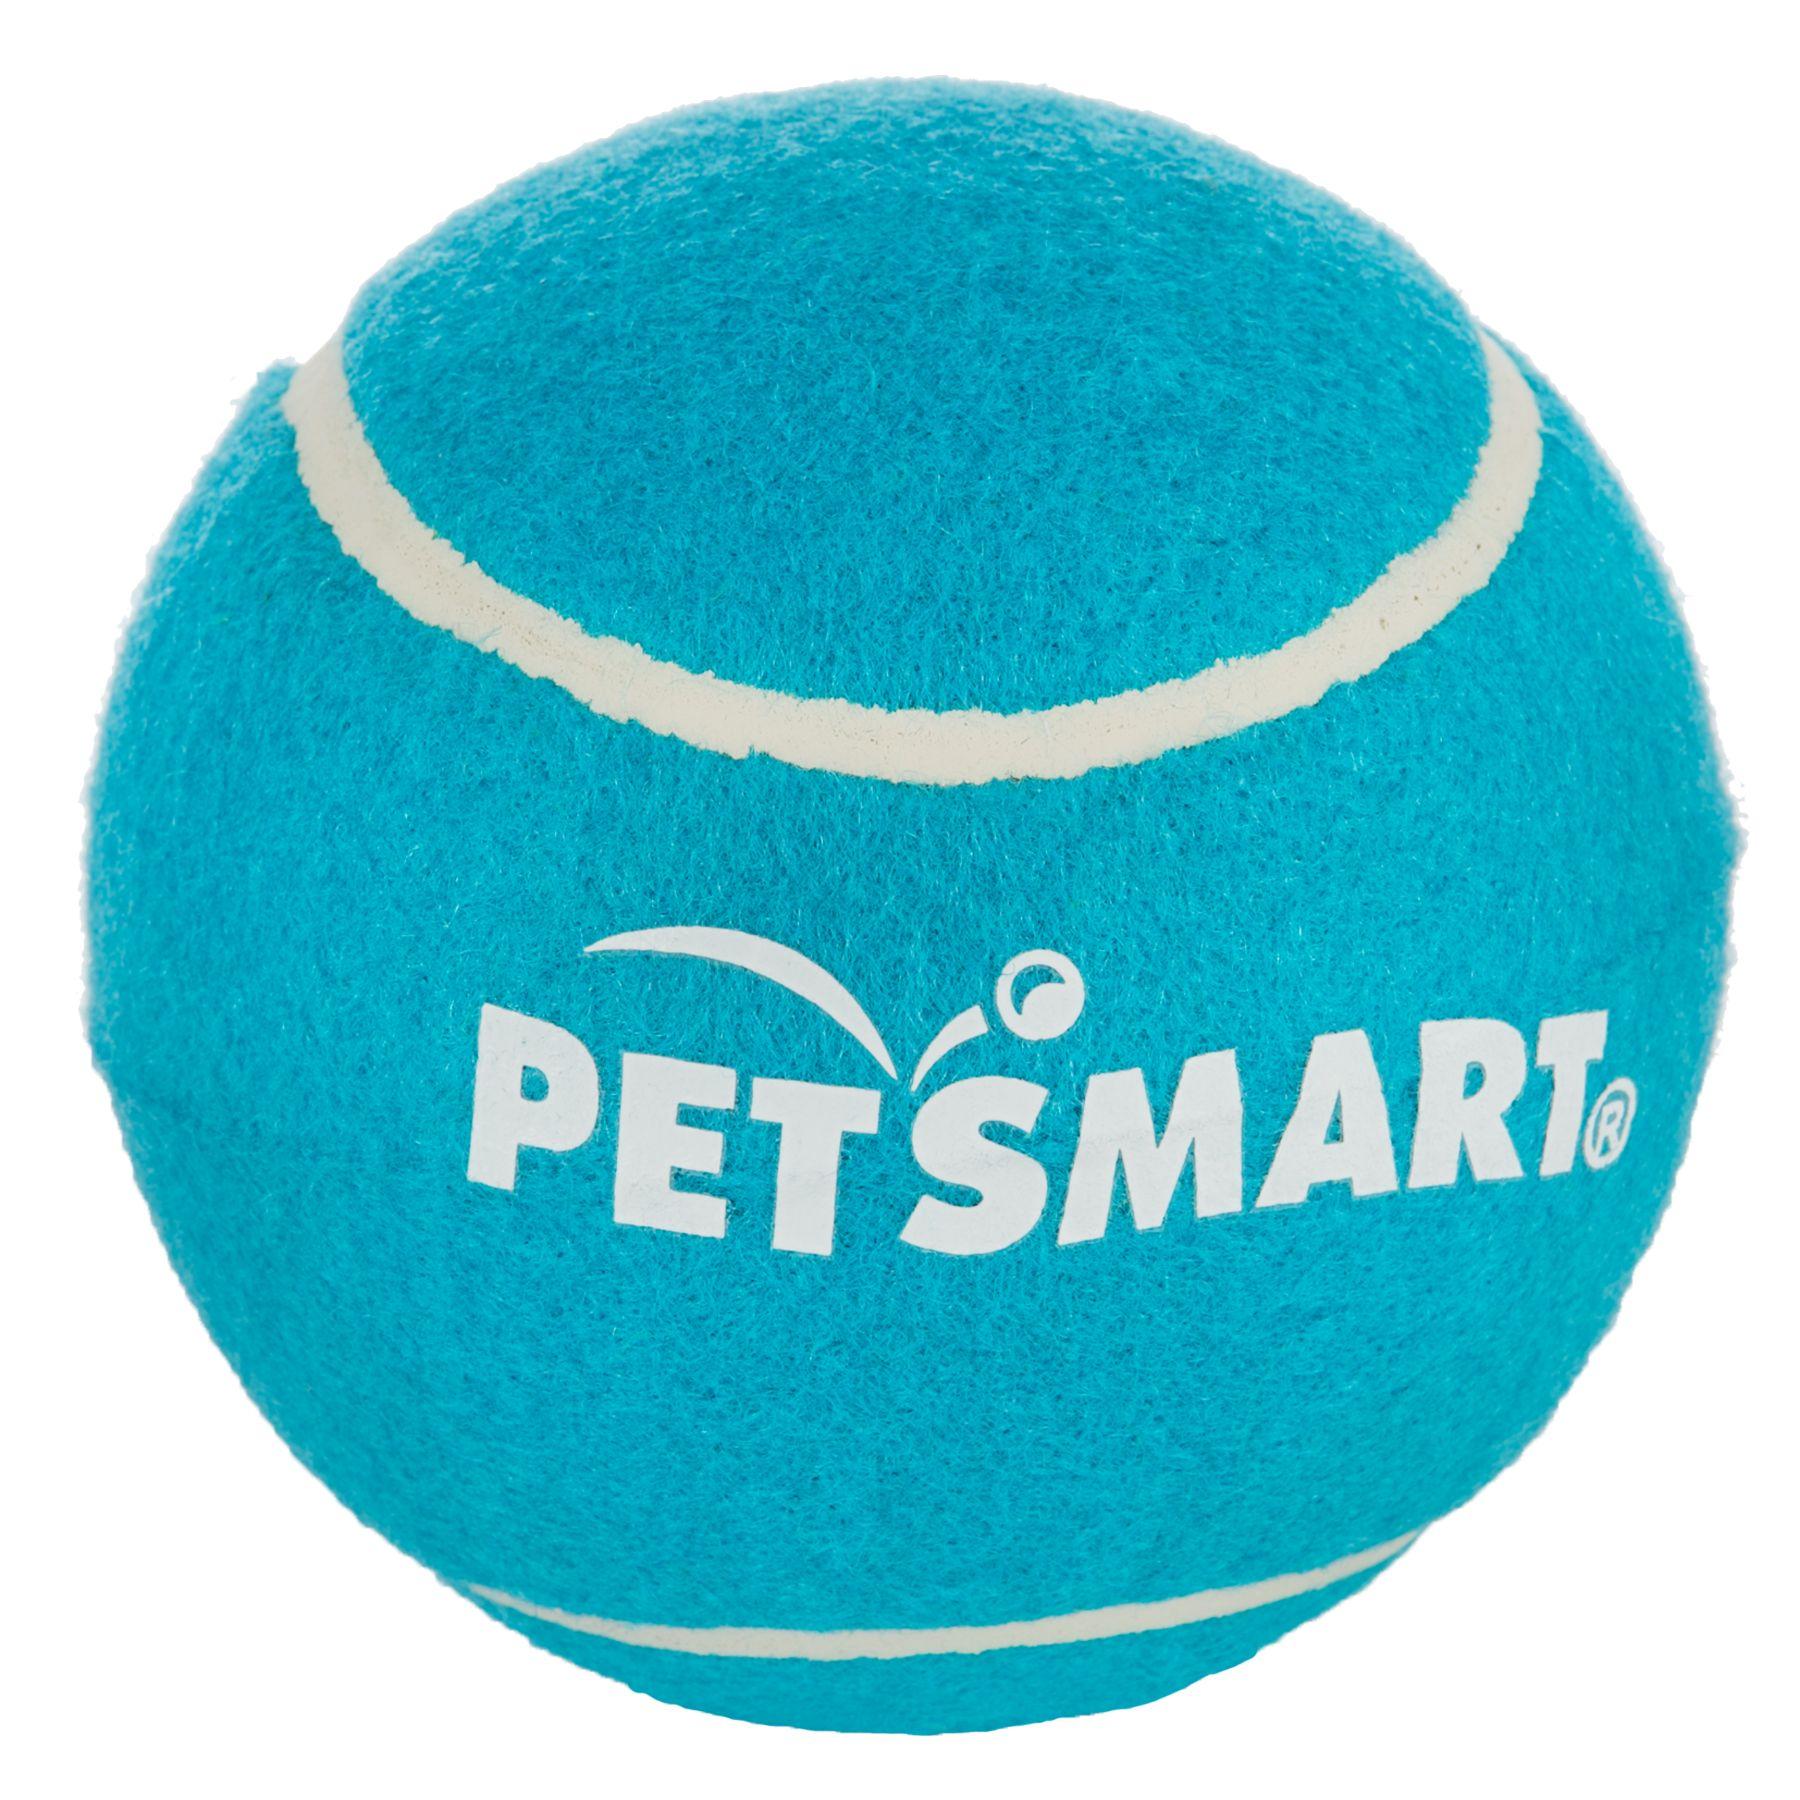 Grreat Choice PetSmart Giant Tennis Ball, Blue Tennis